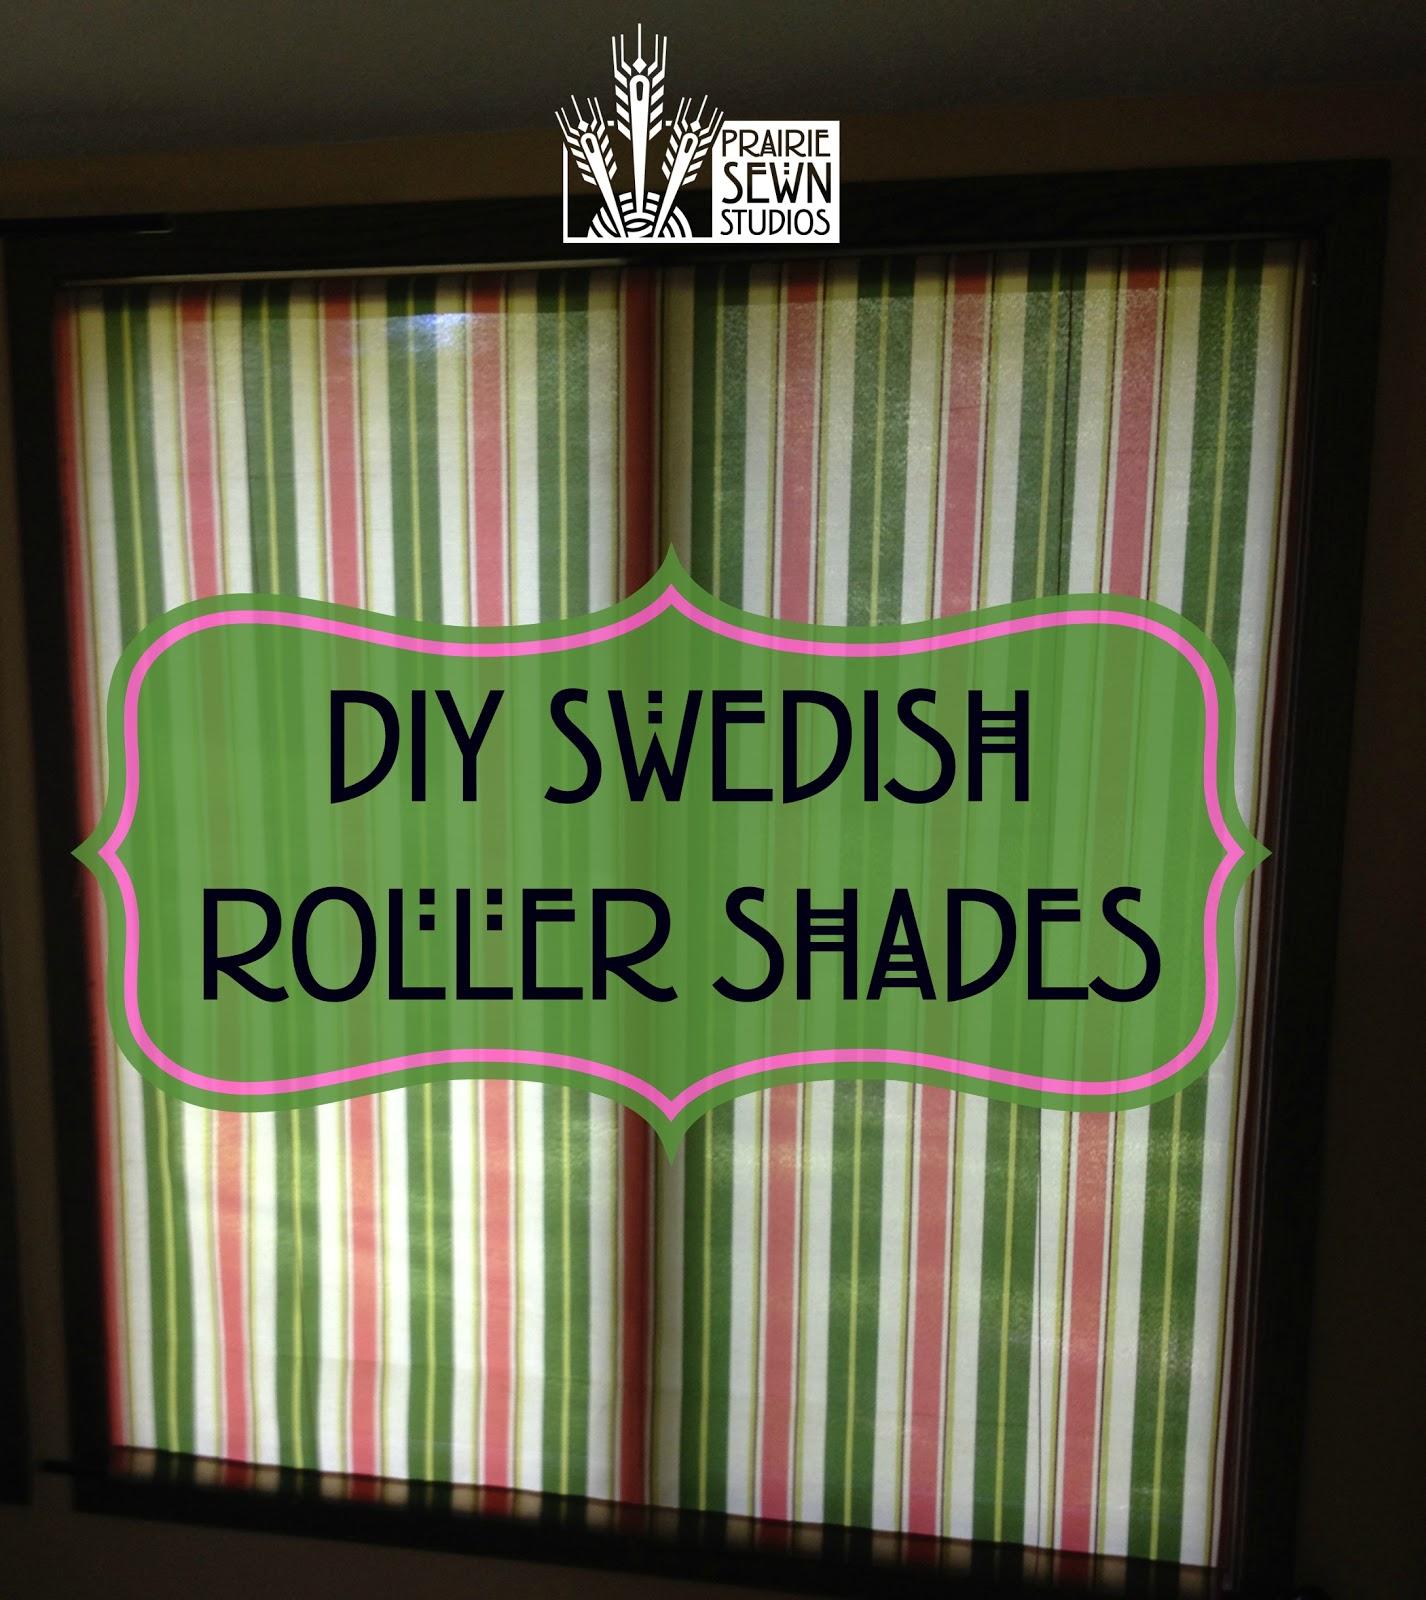 DIY Swedish Roller Shades